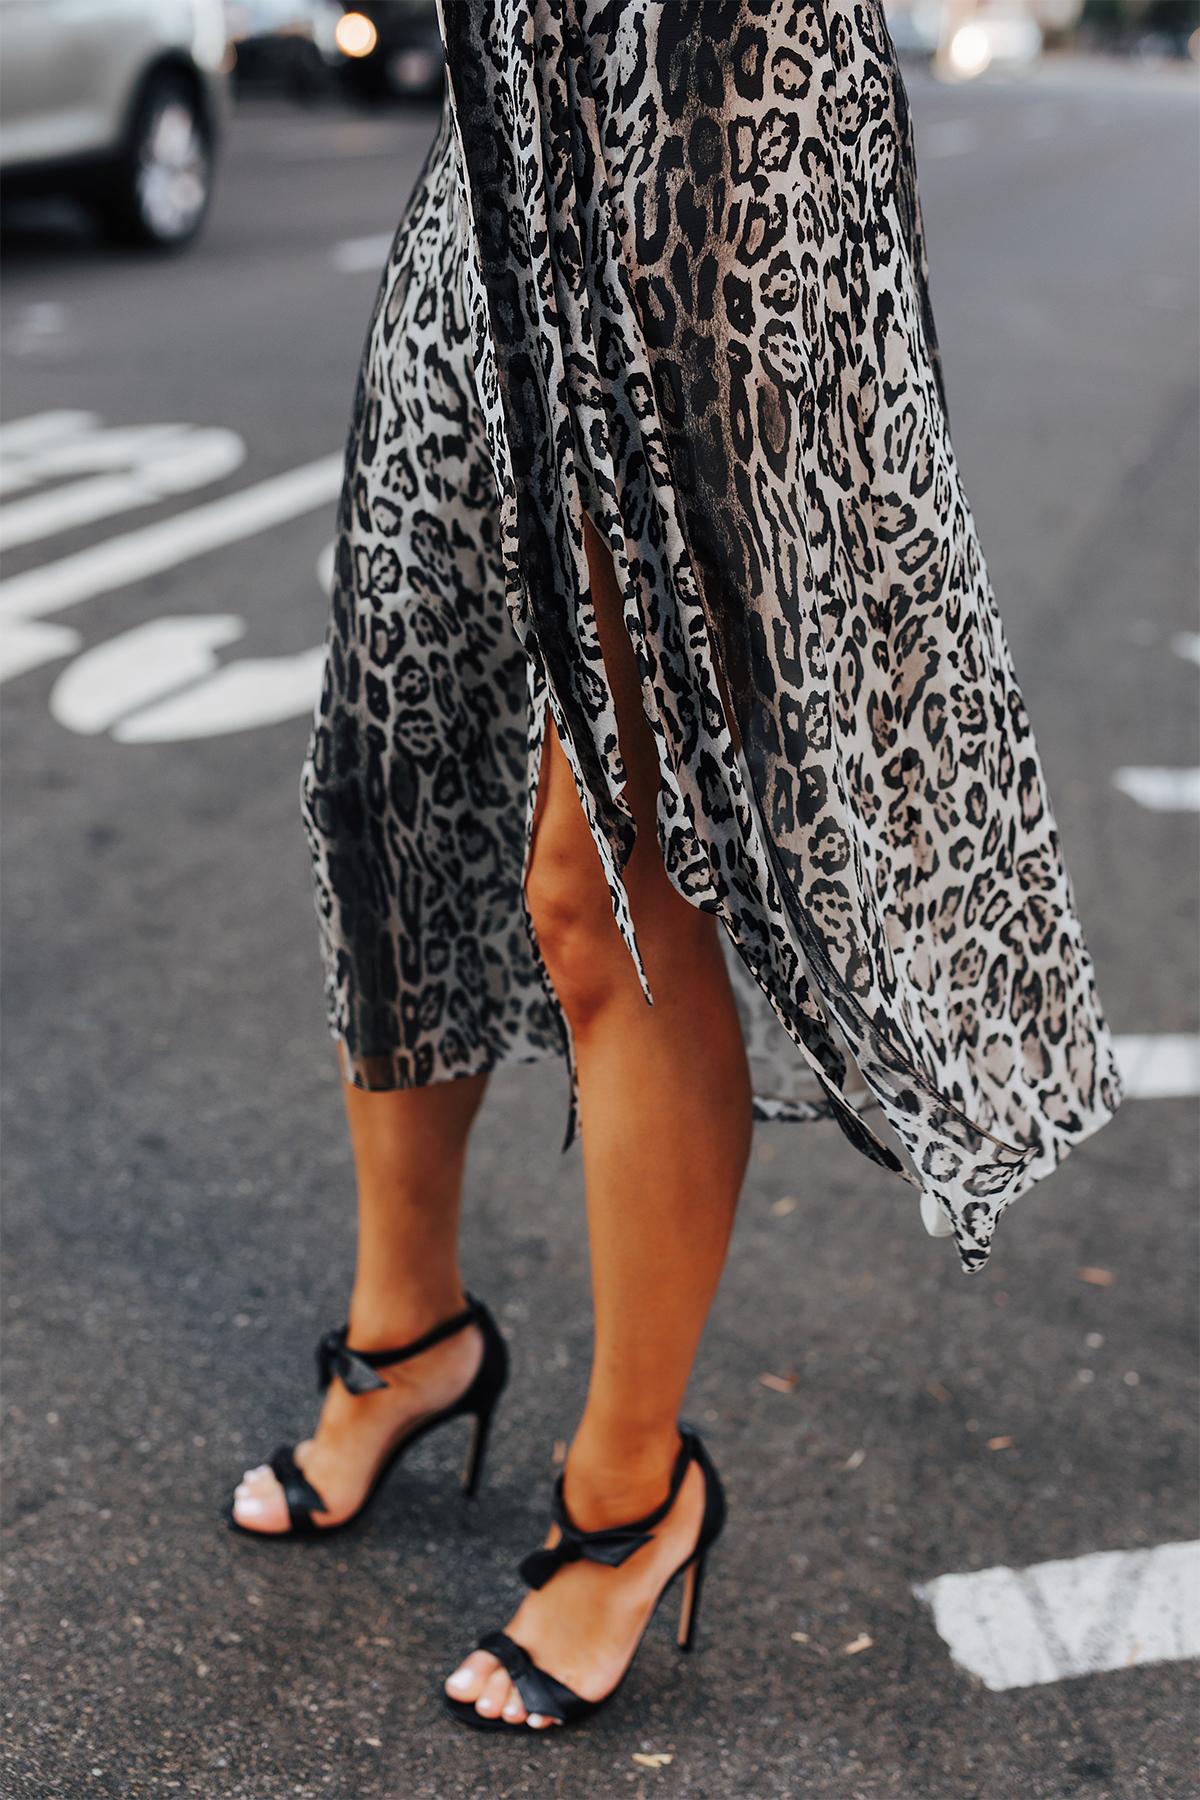 Fashion Jackson Wearing tommy hilfiger zendaya collection snow leopard dress Black Tie Heeled Sandals 1